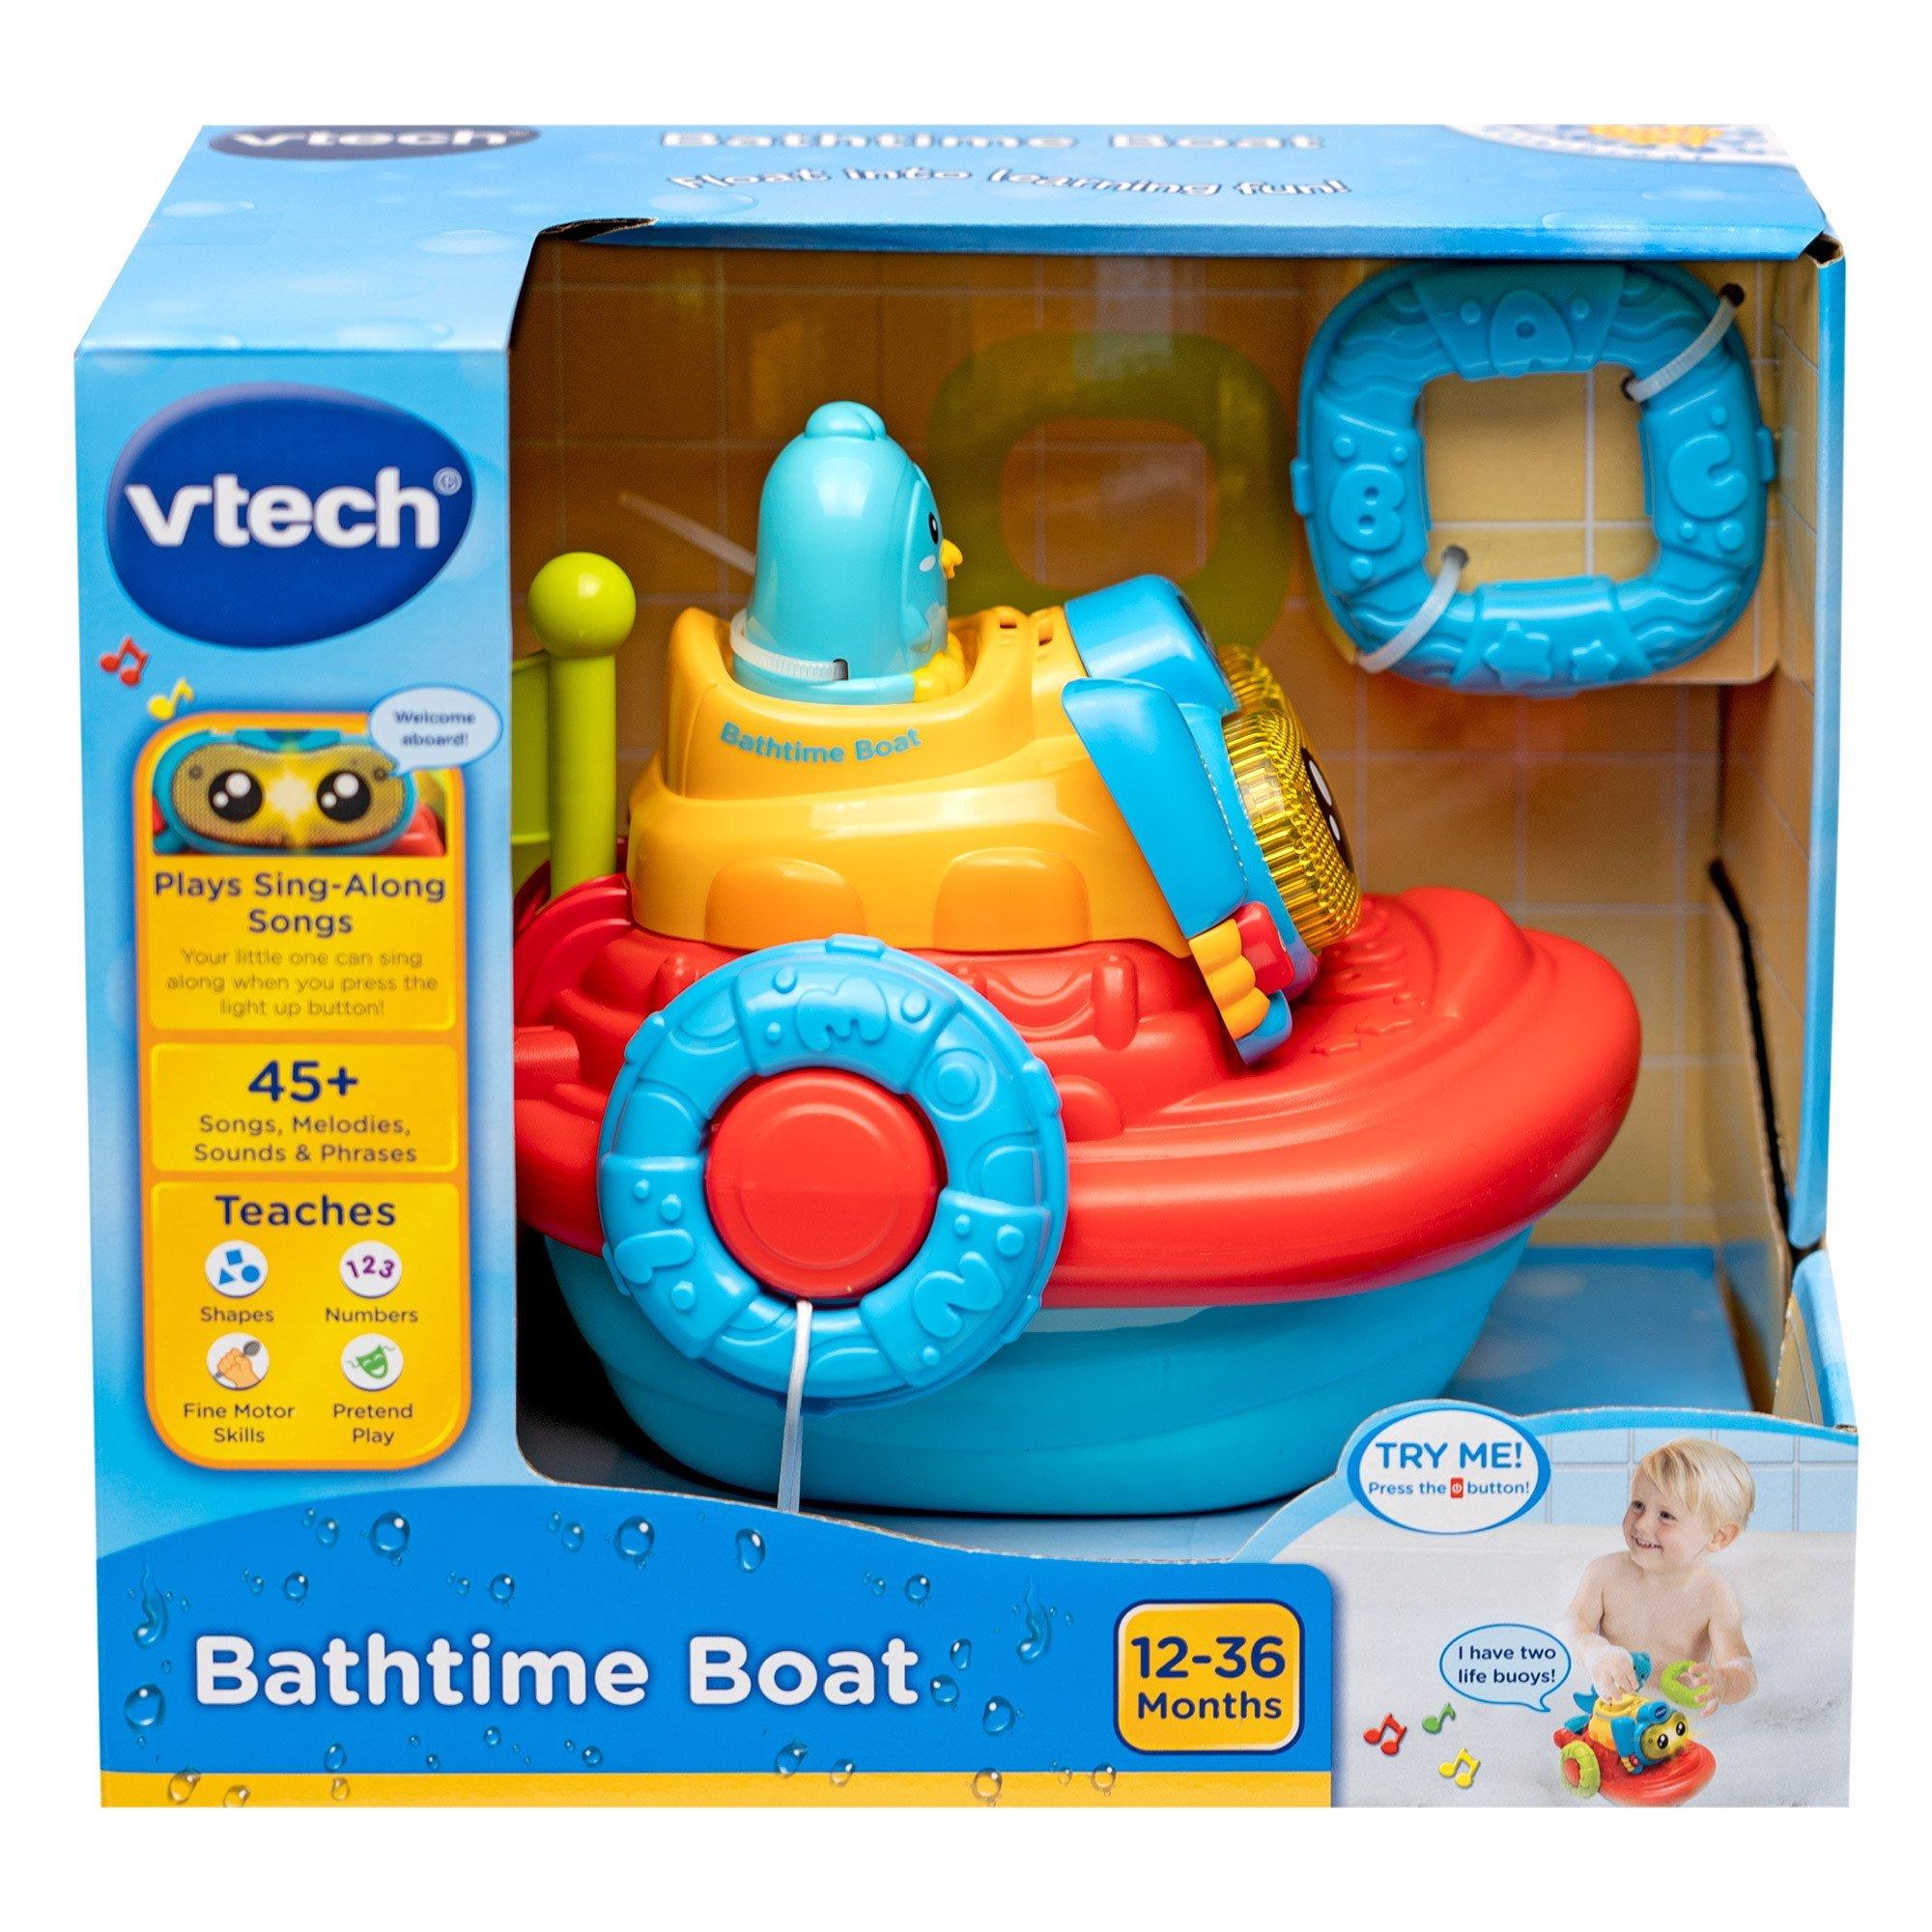 Buy Vtech Toys Online in Ireland